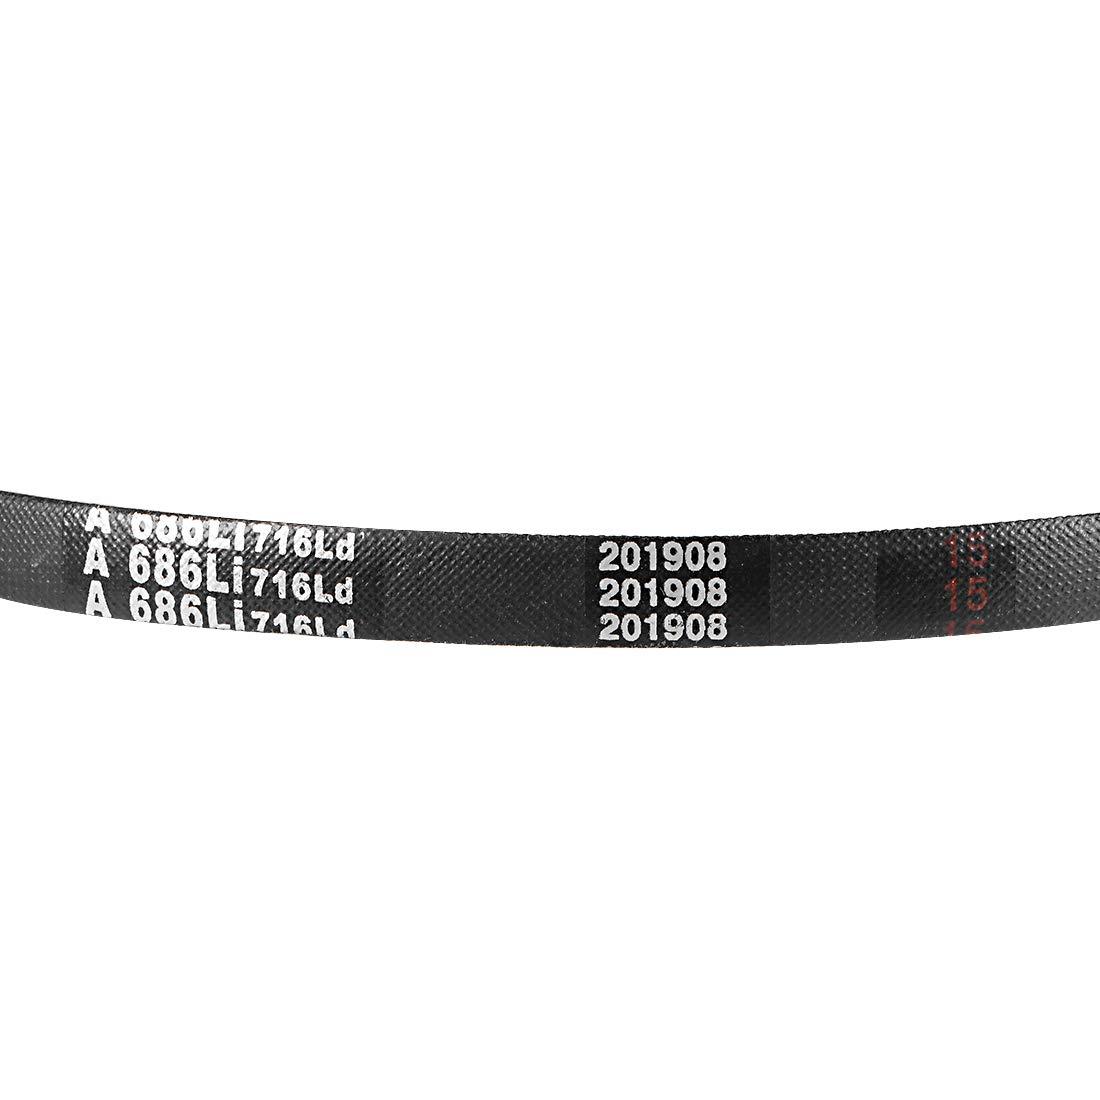 Pix A Section Vee Belt A27-686MM